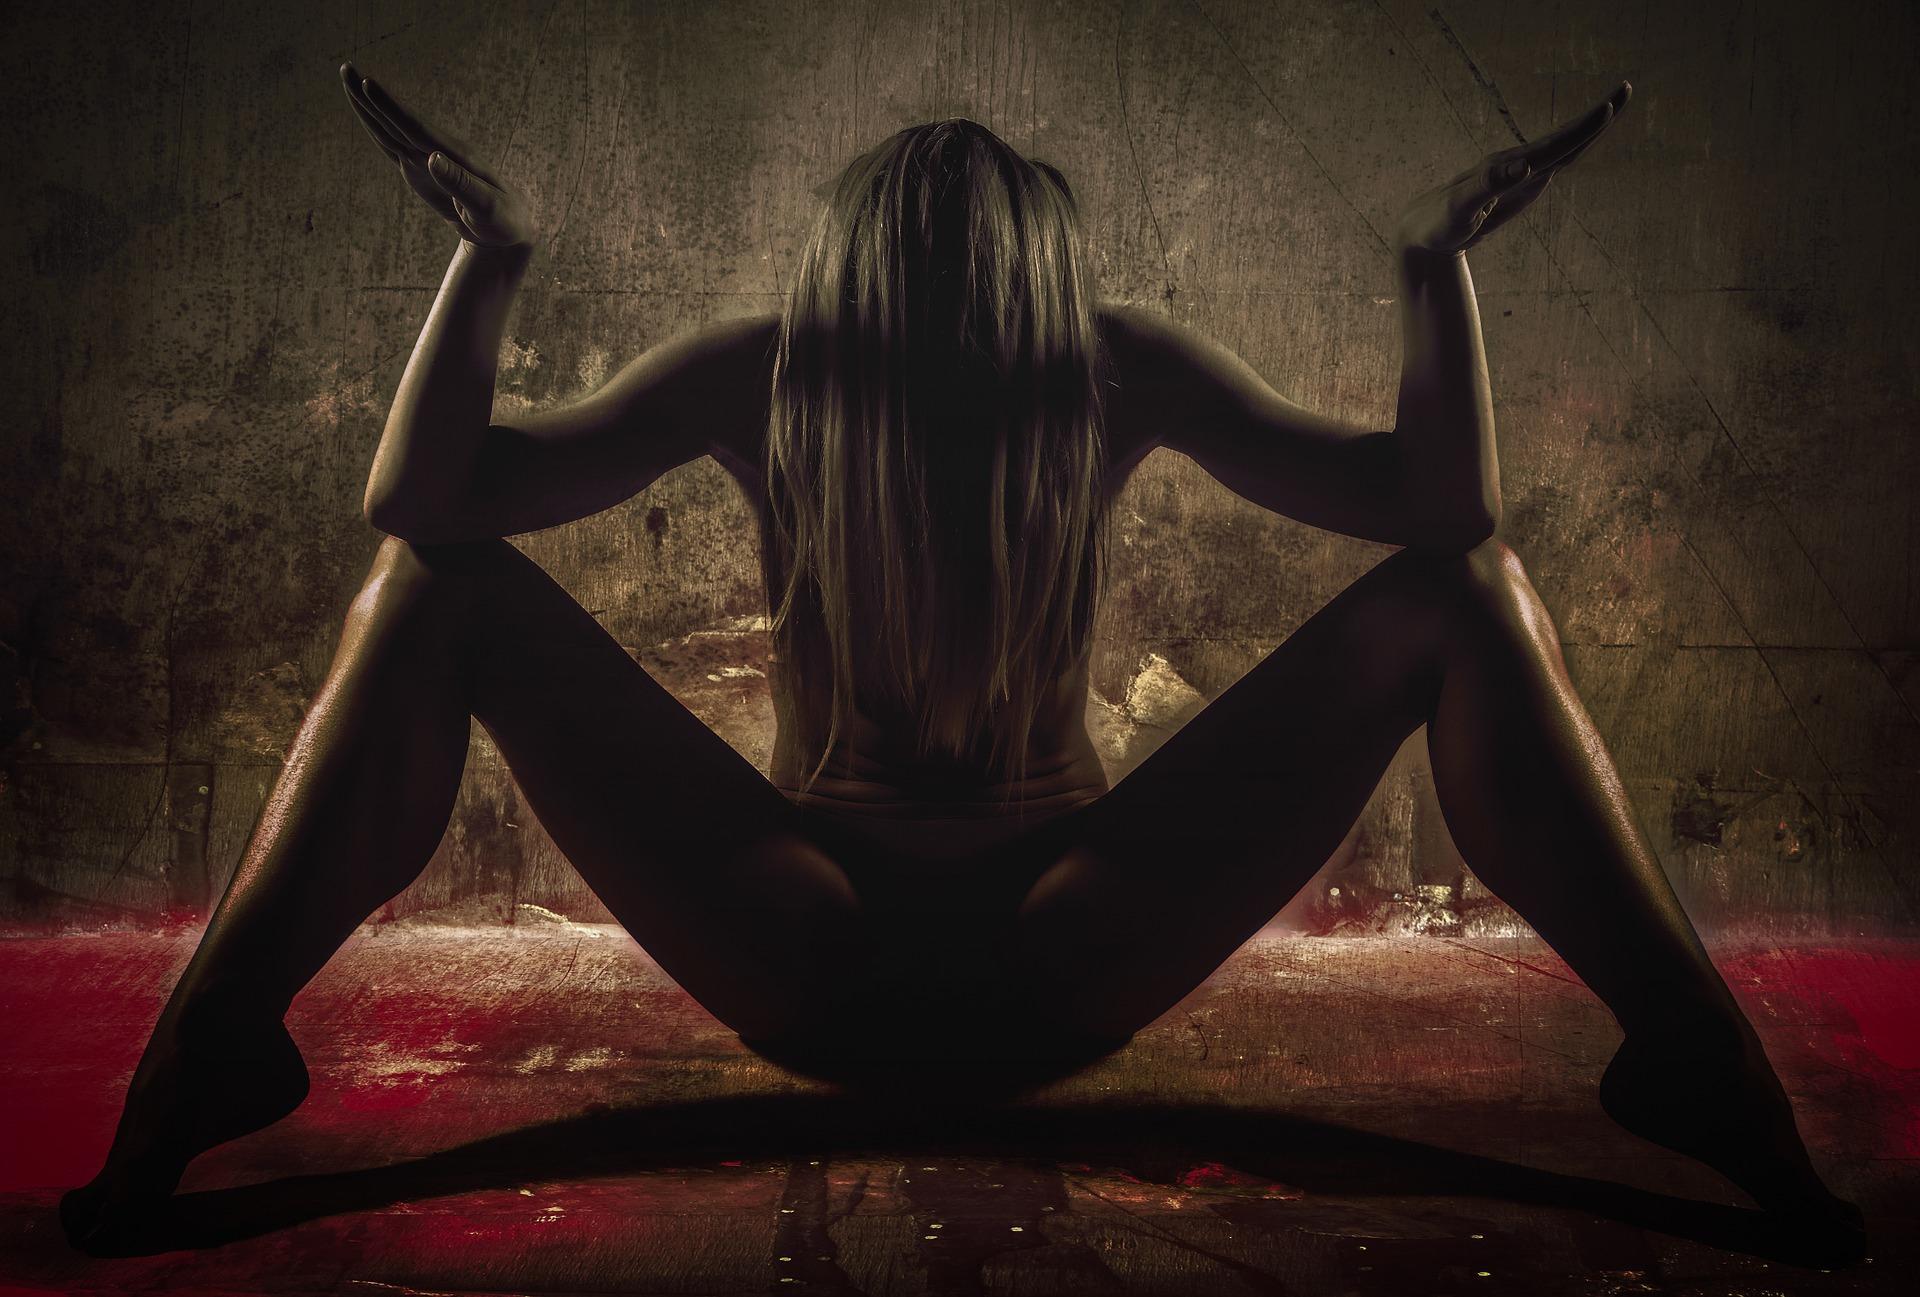 L'invocation de Lilith